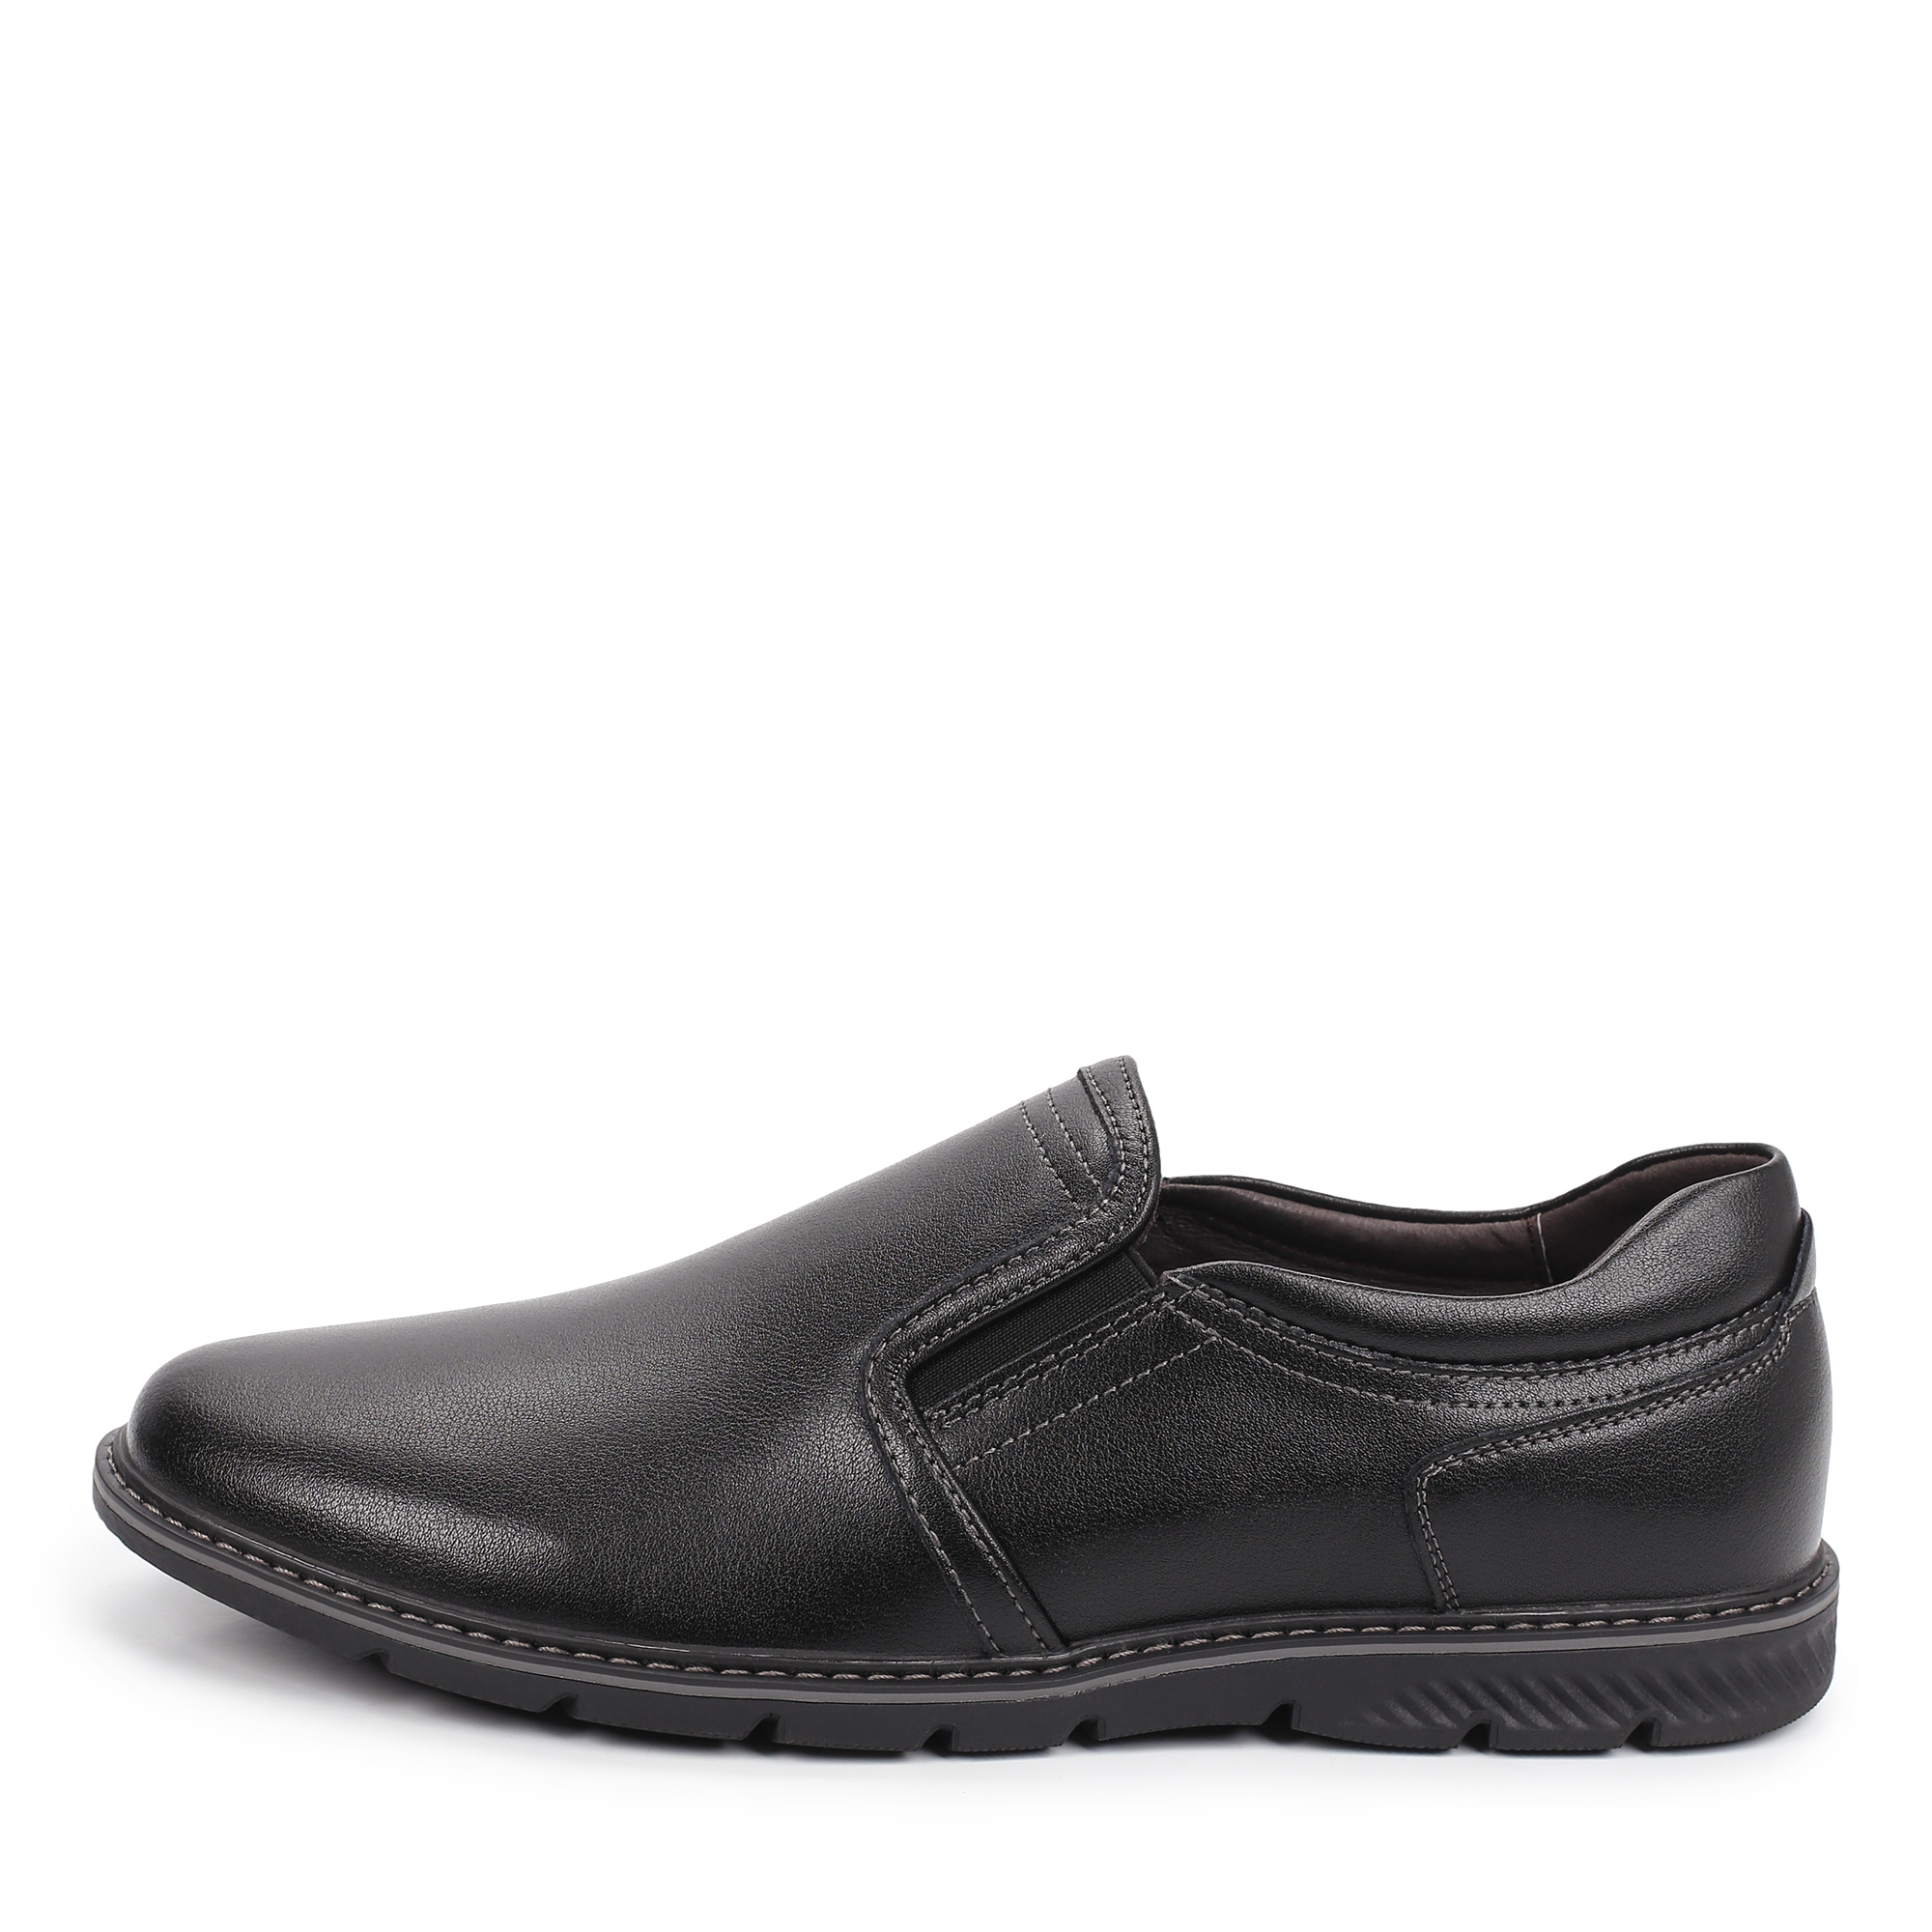 Туфли/полуботинки MUNZ Shoes 098-558A-1602